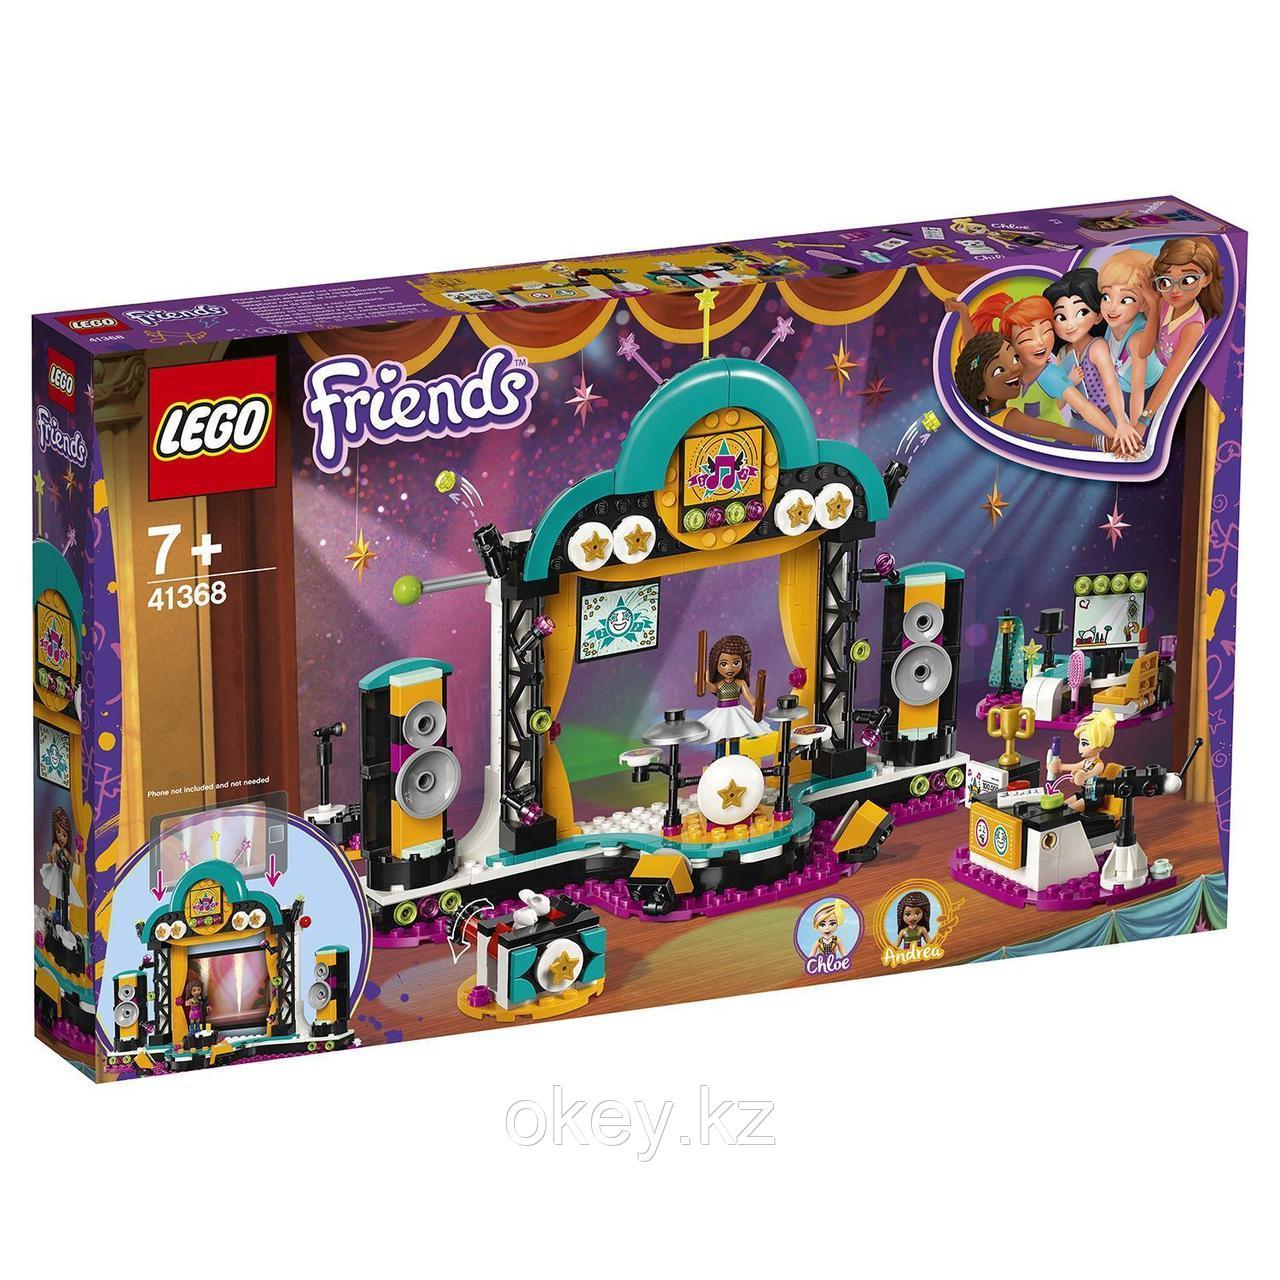 LEGO Friends: Шоу талантов 41368